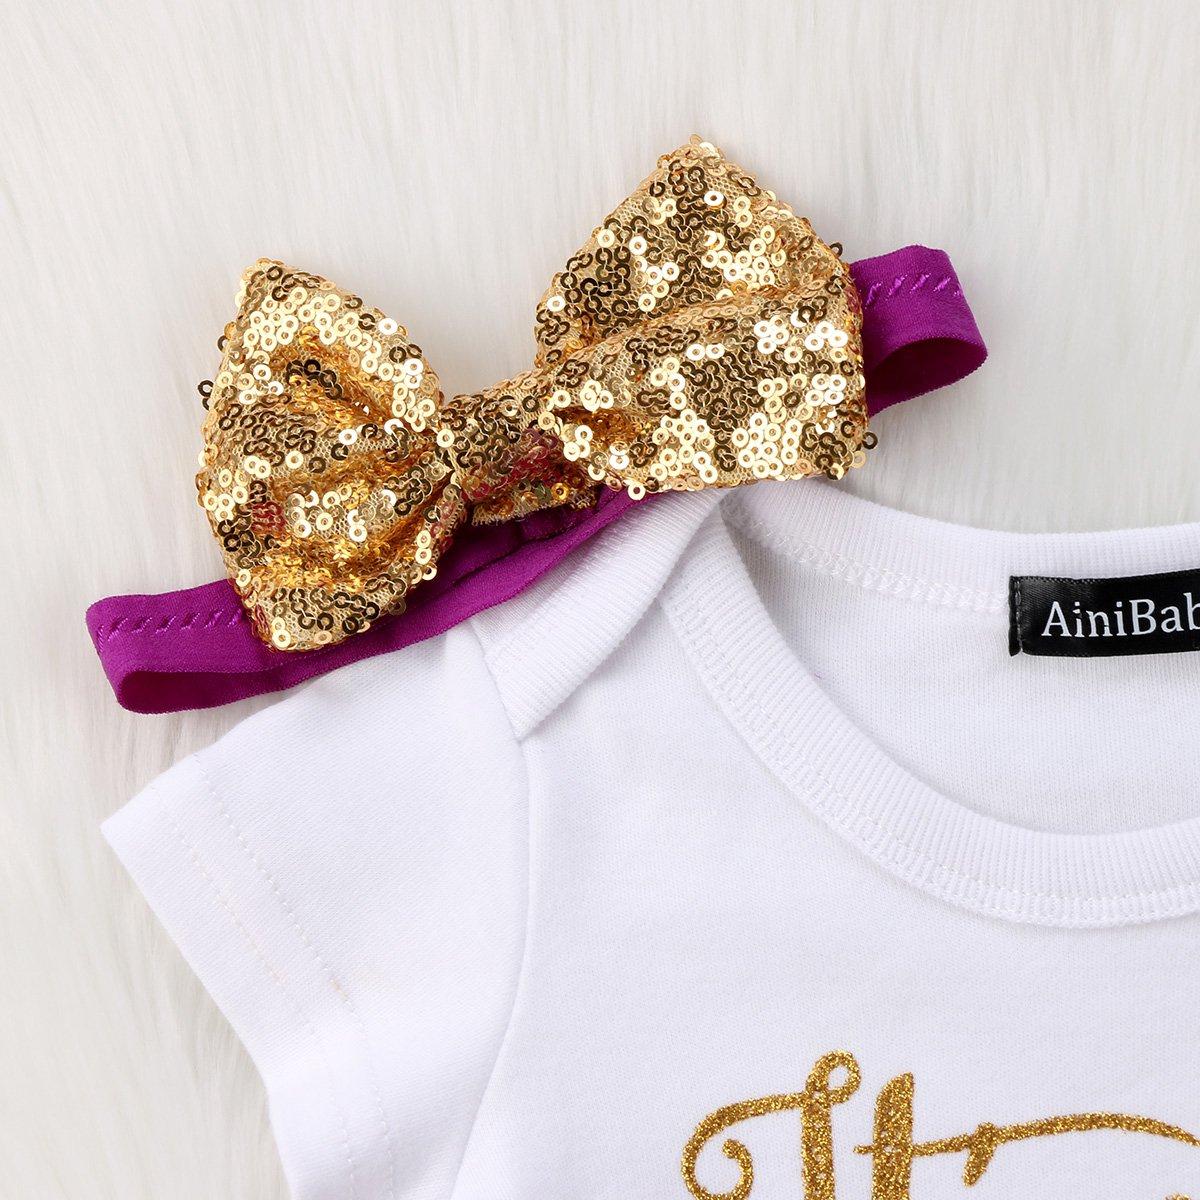 3PCS Unicorn Outfit Newborn Baby Girls 1st Birthday Romper Headband Clothing Set Tutu Skirt Dress